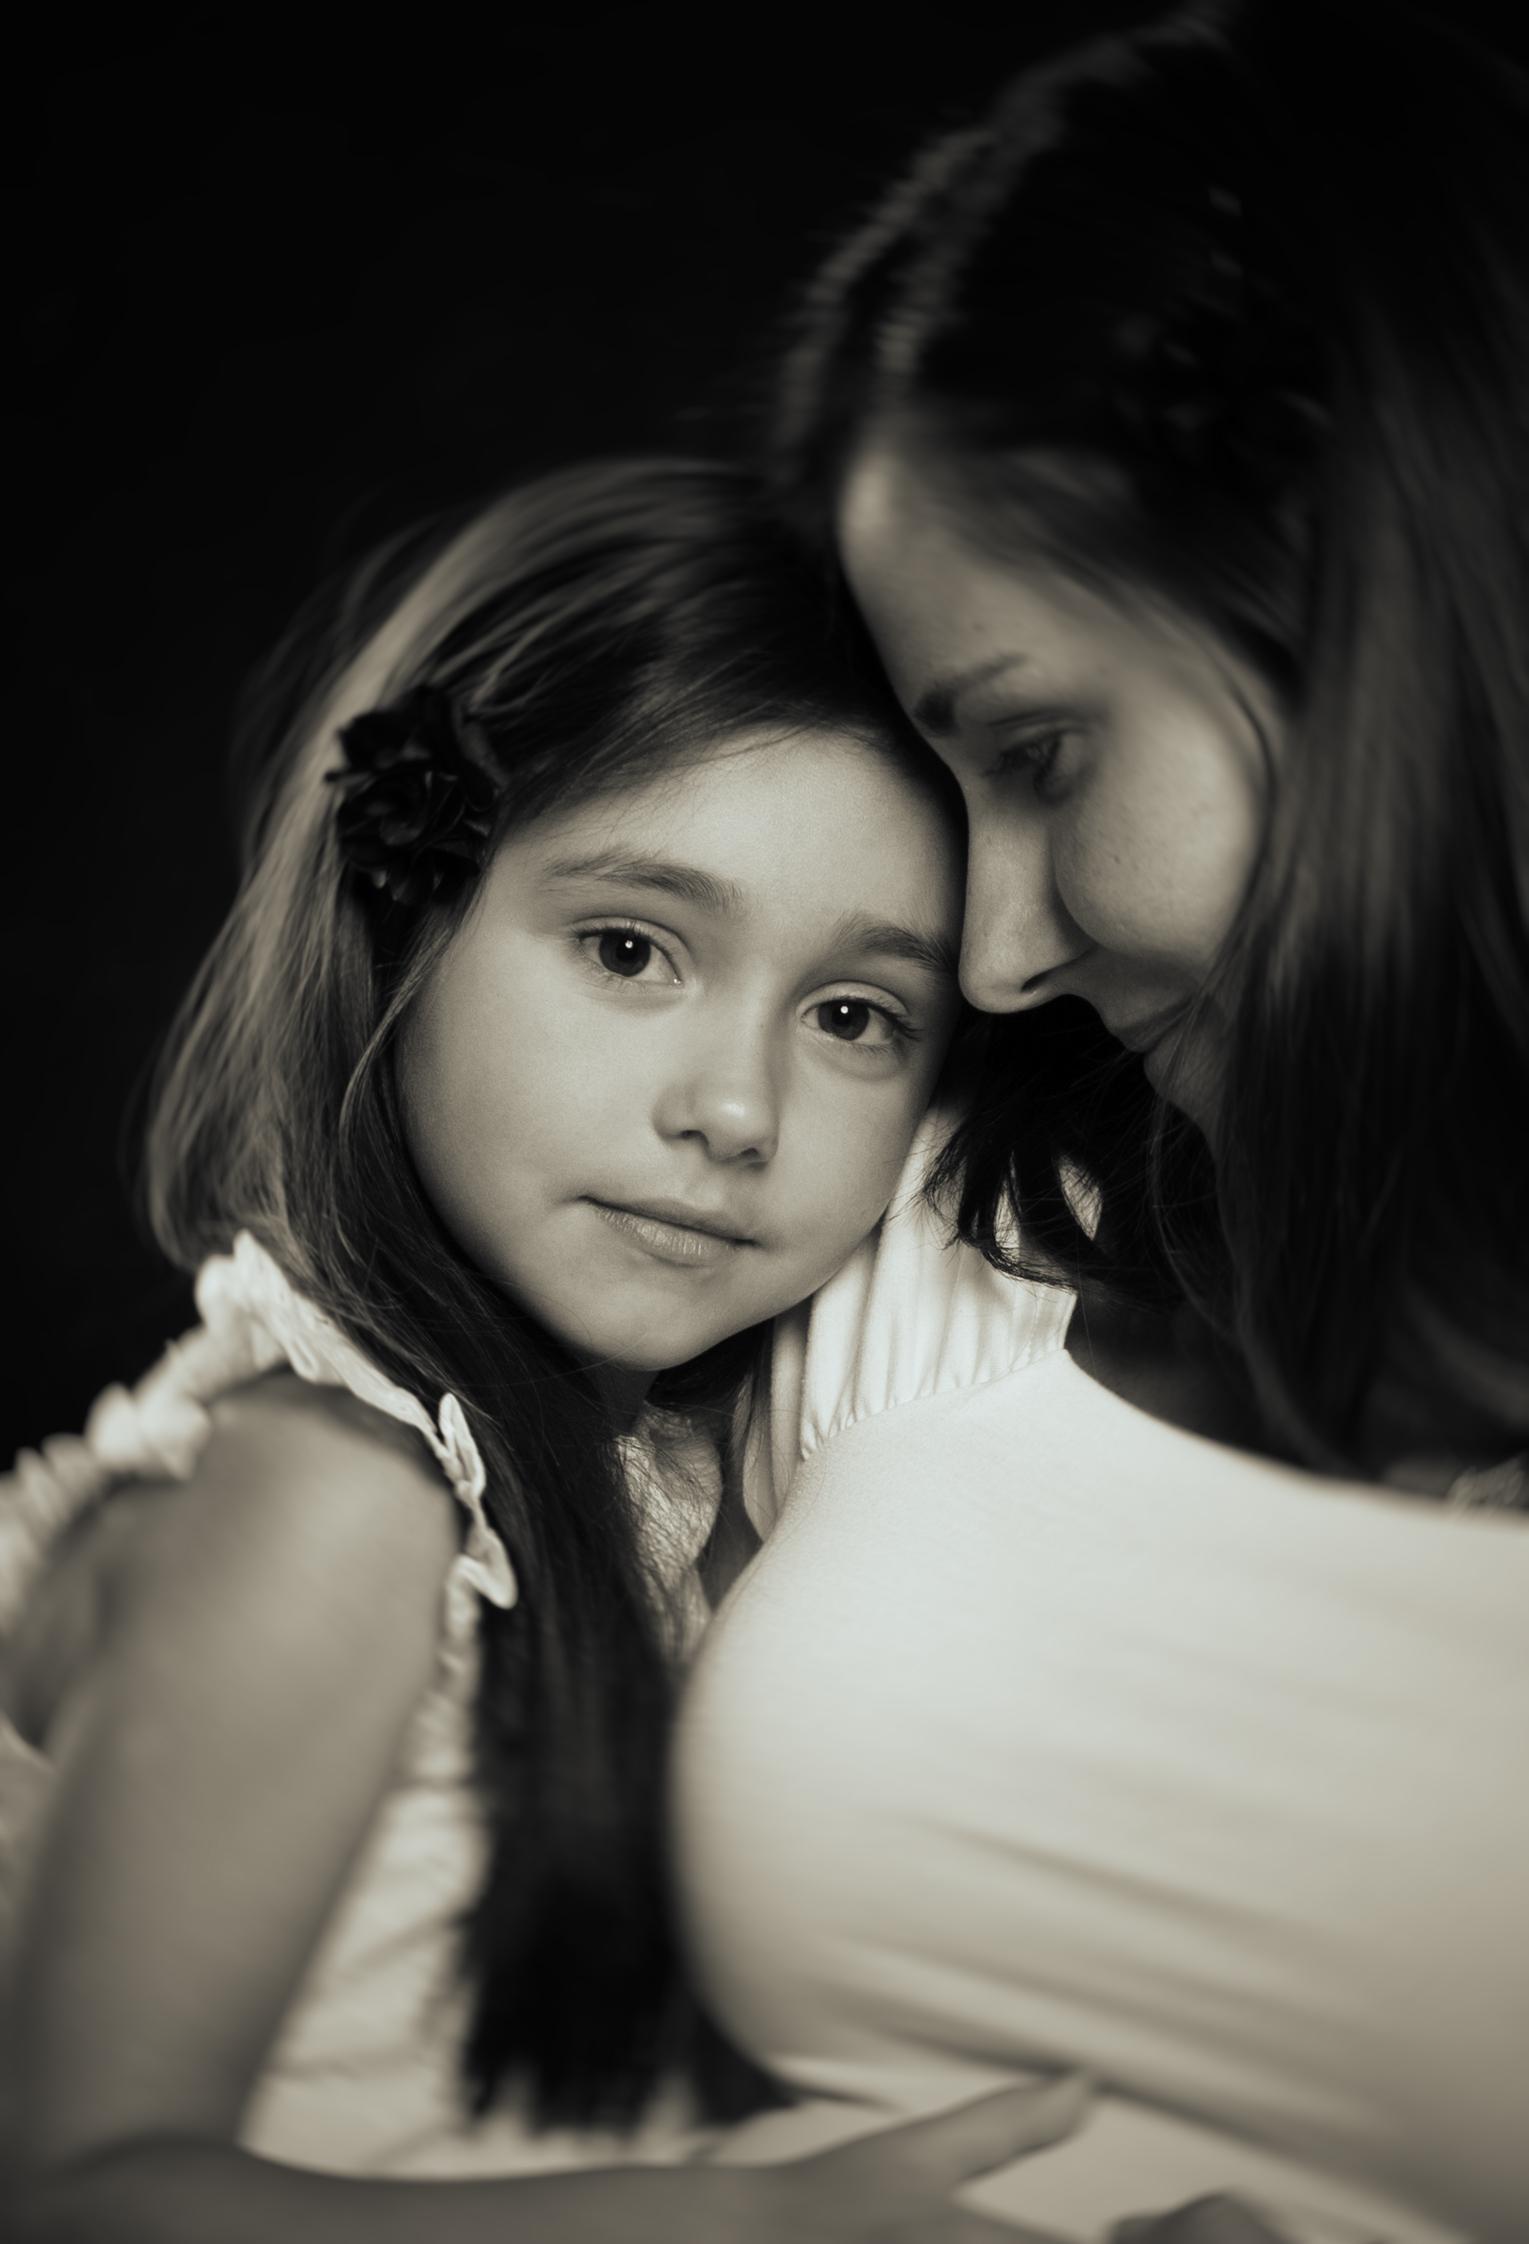 marta-hewson-little-girl-with-her-mother-fine-art-portraiture.jpg